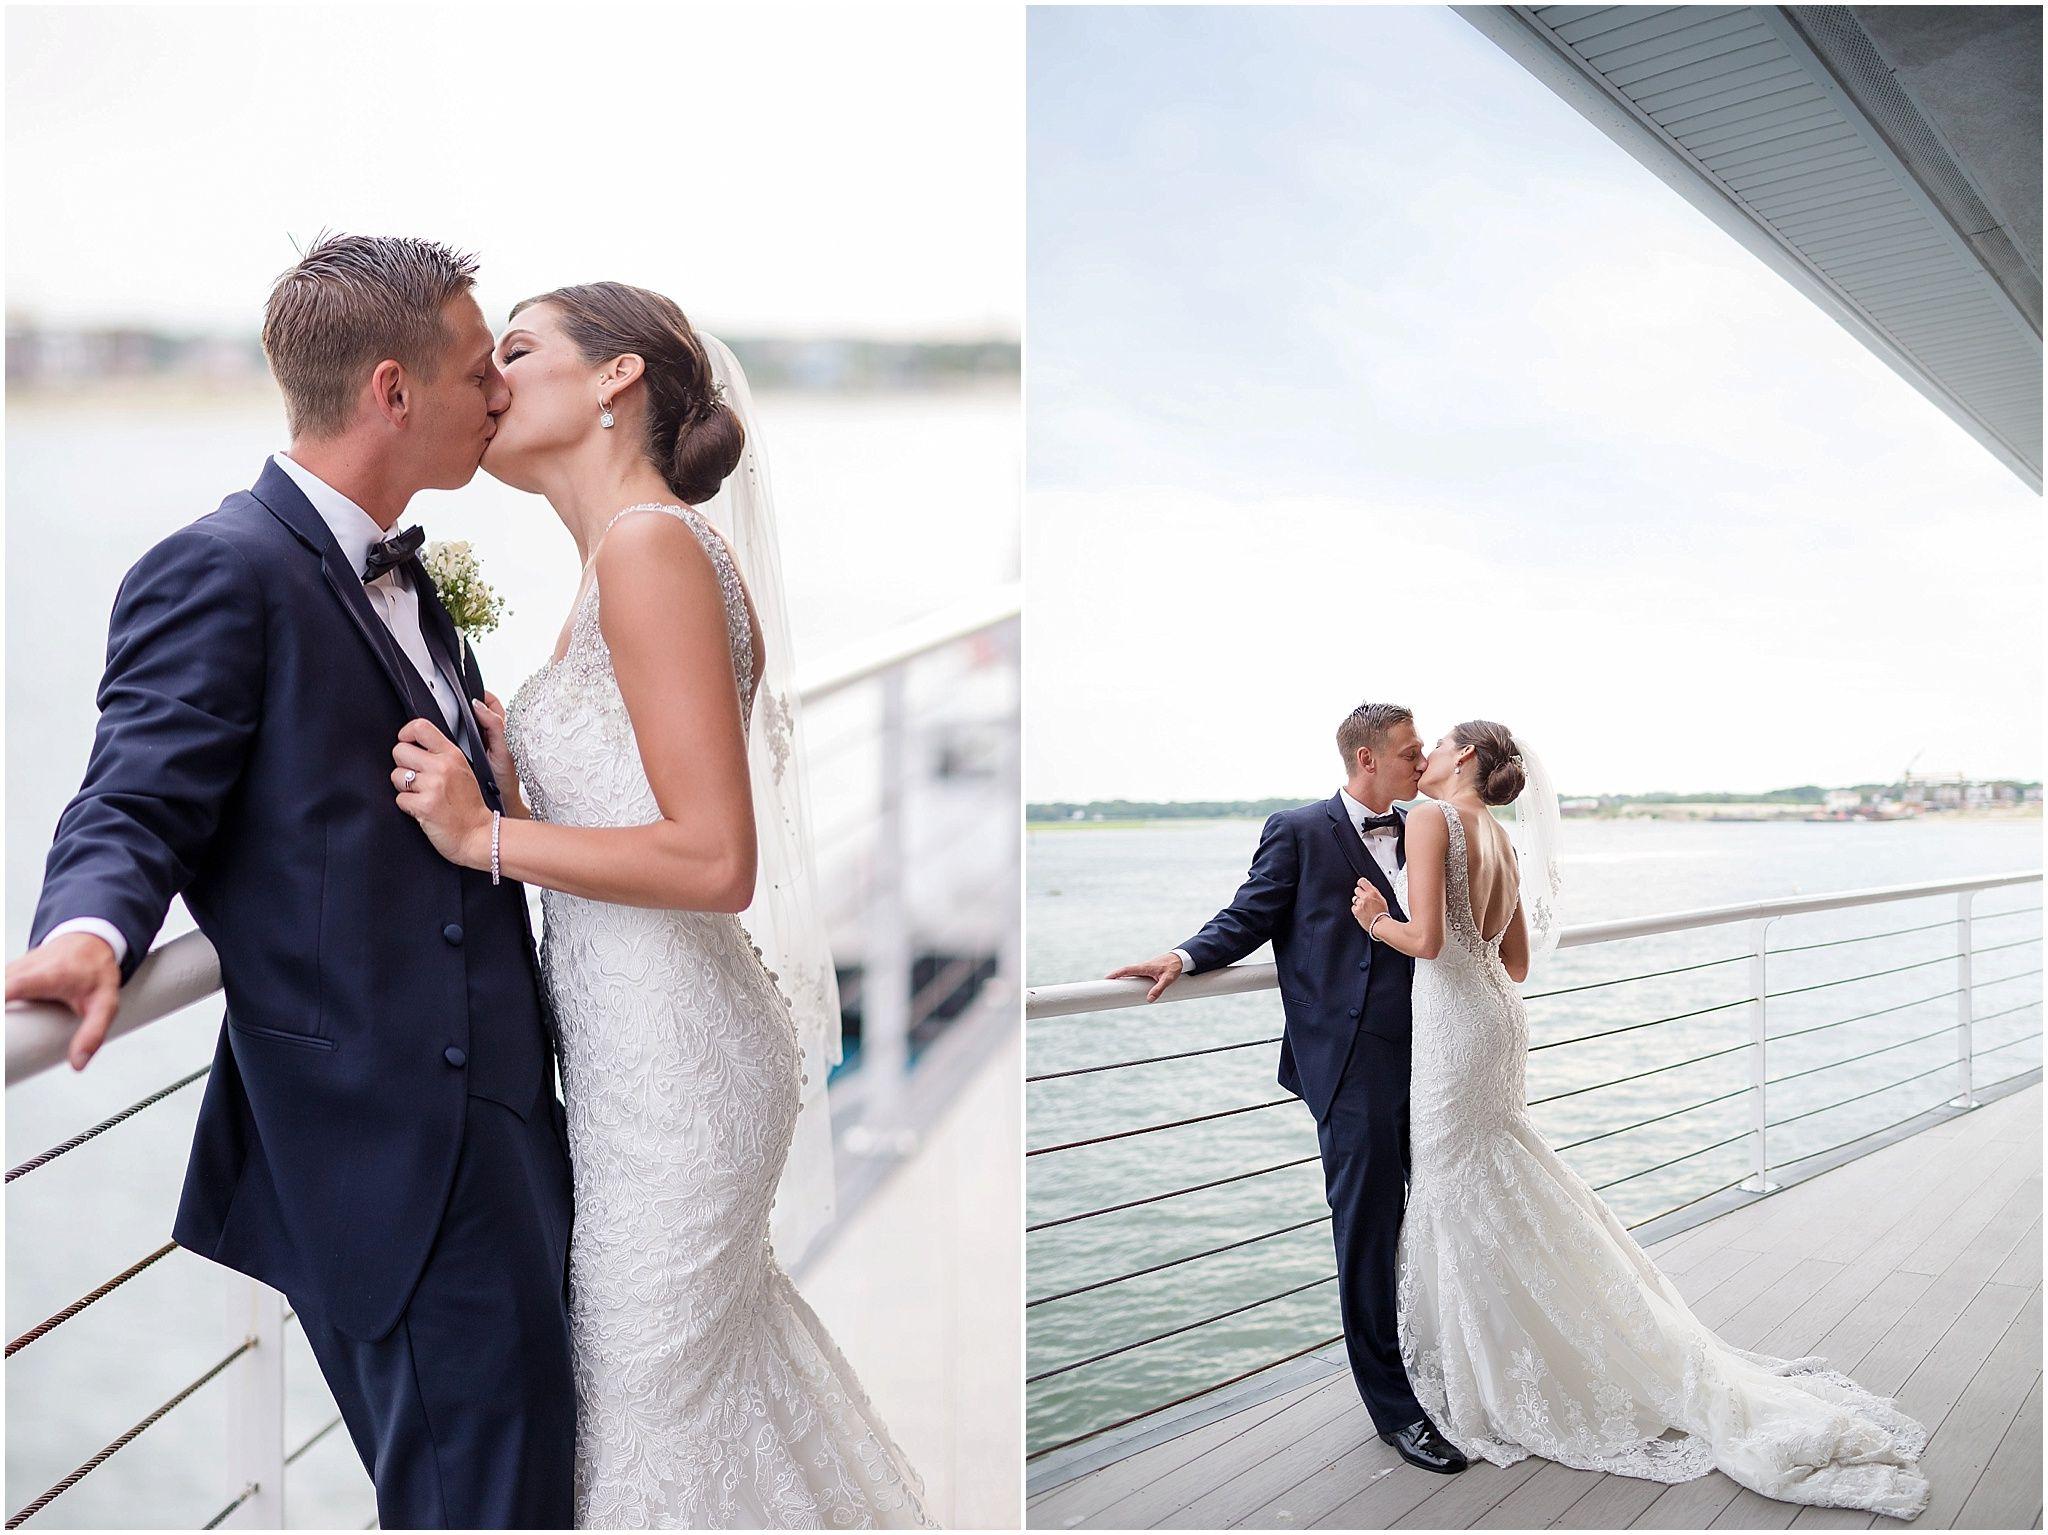 David & Amanda { Wedding at The Lesner Inn Virginia